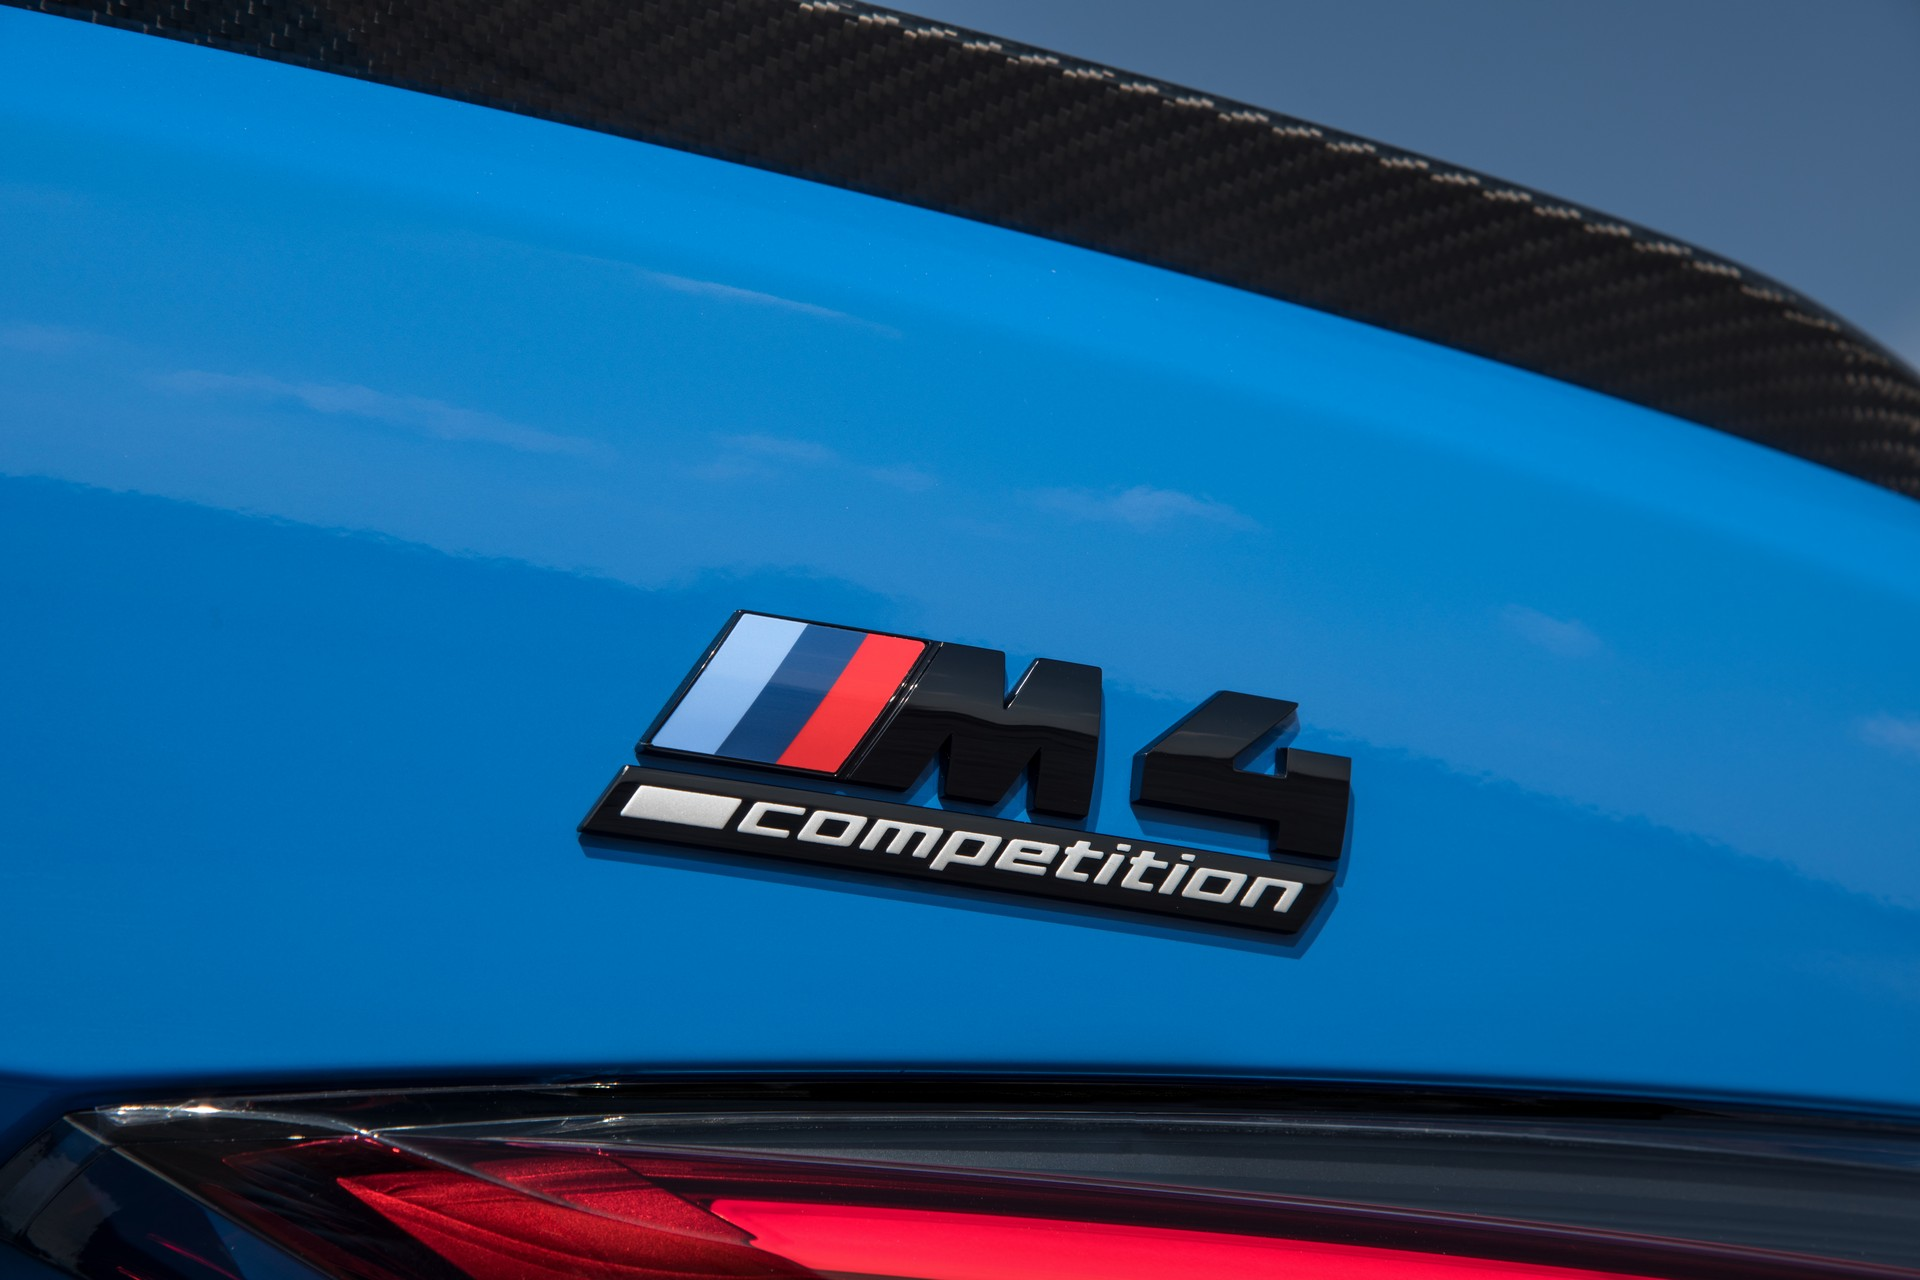 BMW-M3-M4-Competition-xDrive-39.jpg